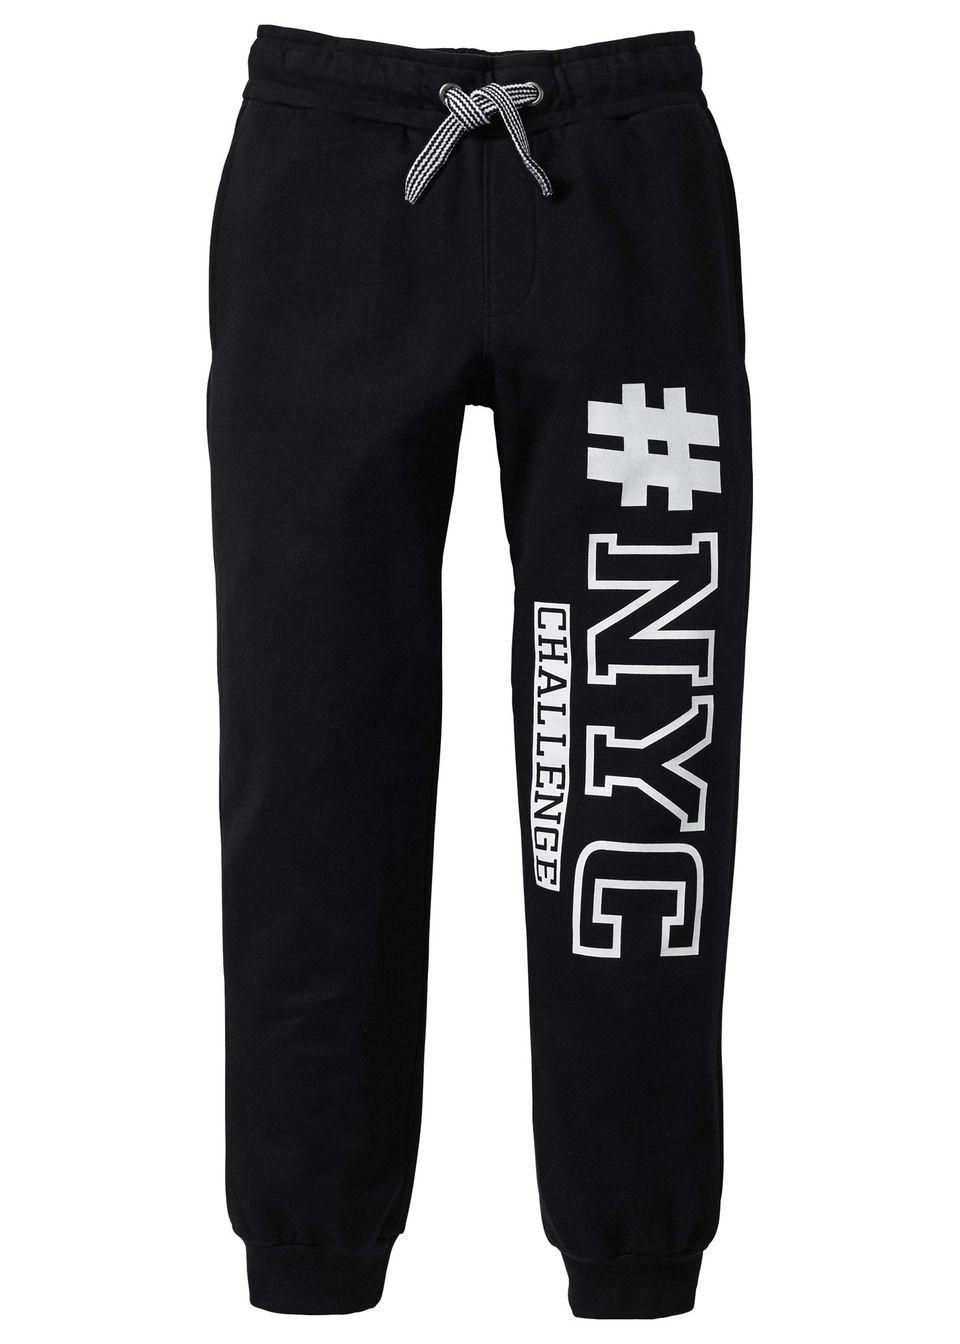 Pantaloni sport cu print bonprix